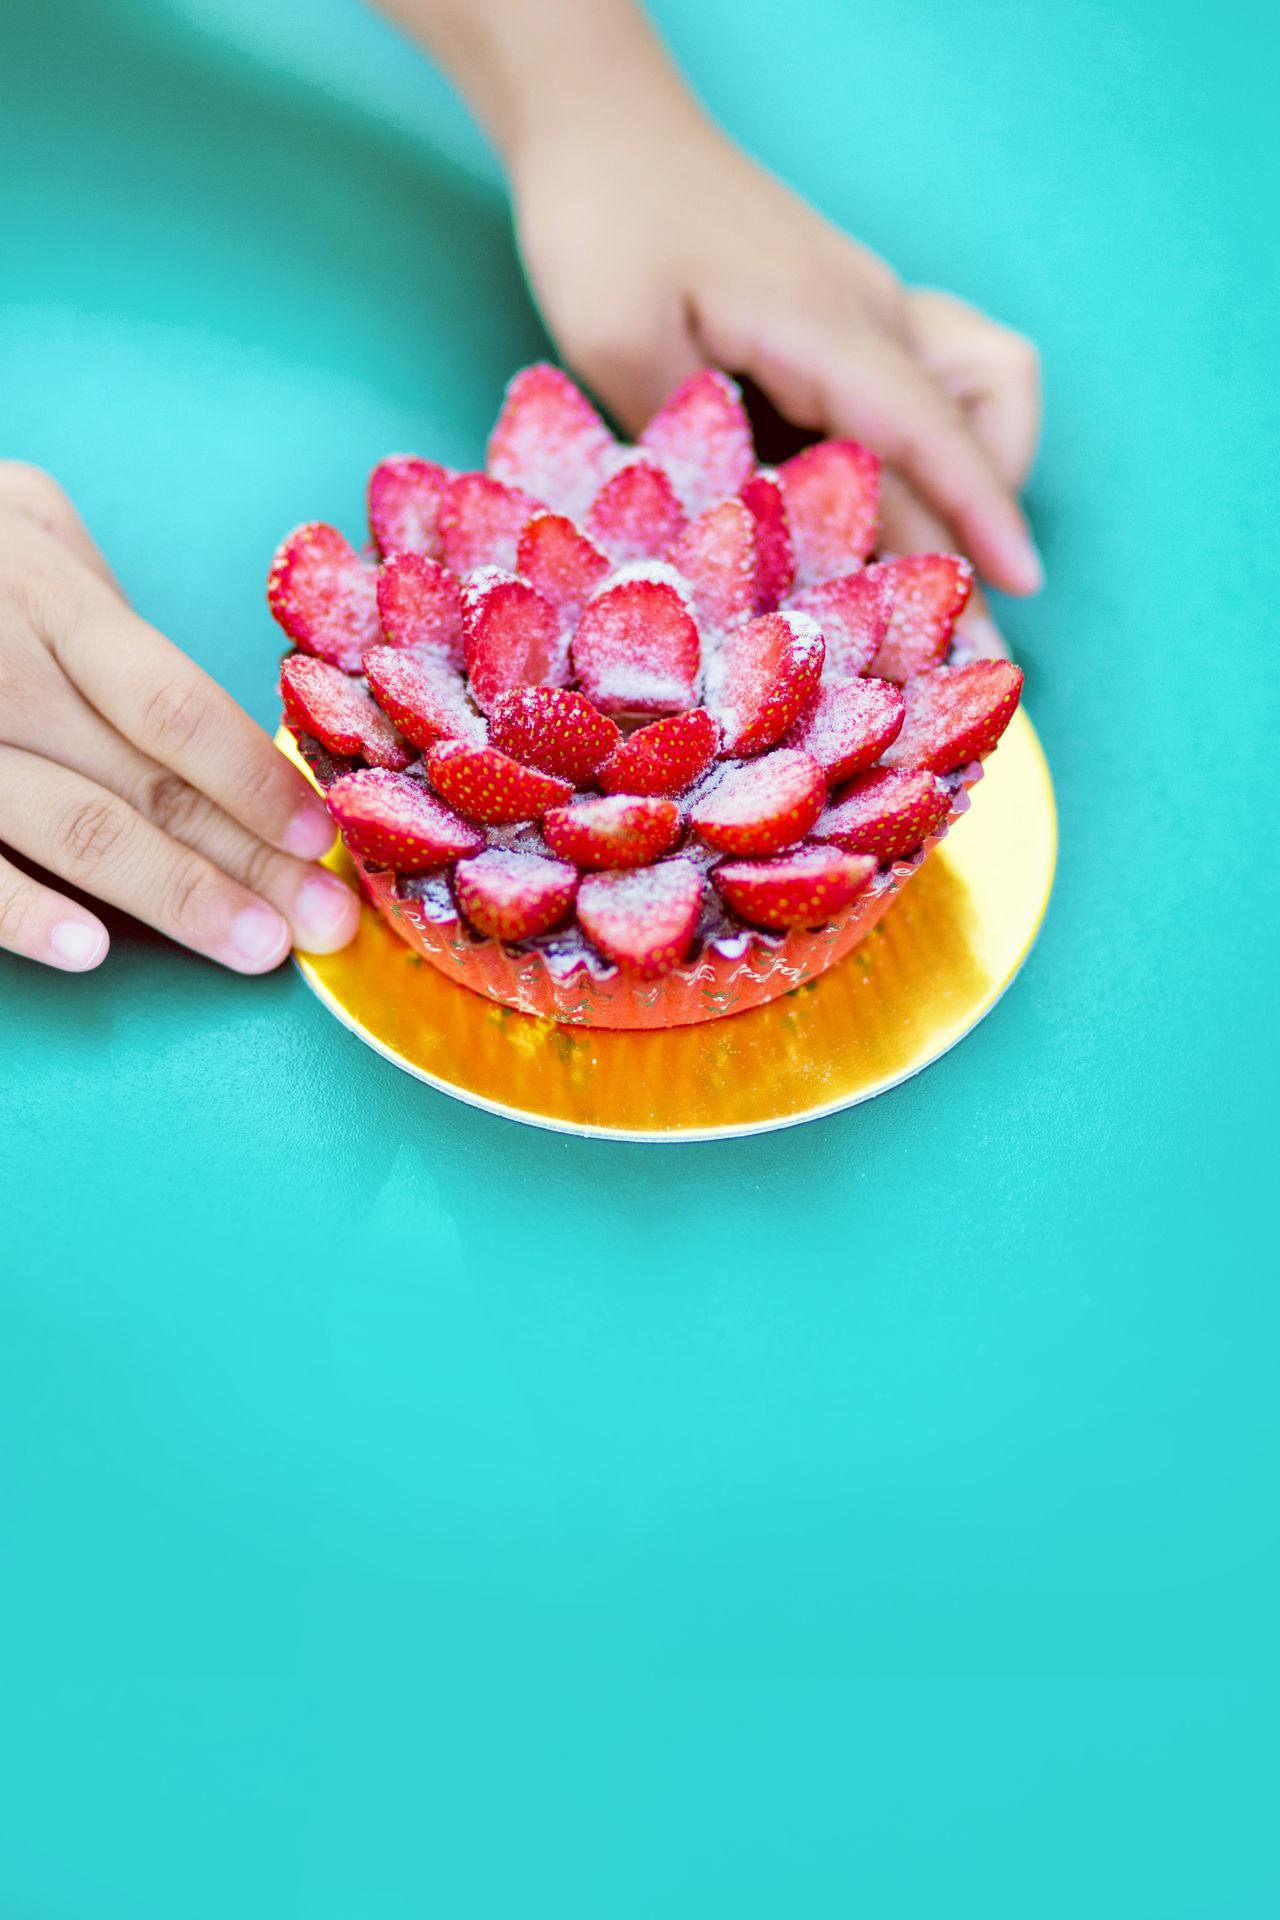 Beautiful stock photos of geburtstagskuchen, Arrangement, Birthday Cake, Blue, Cake